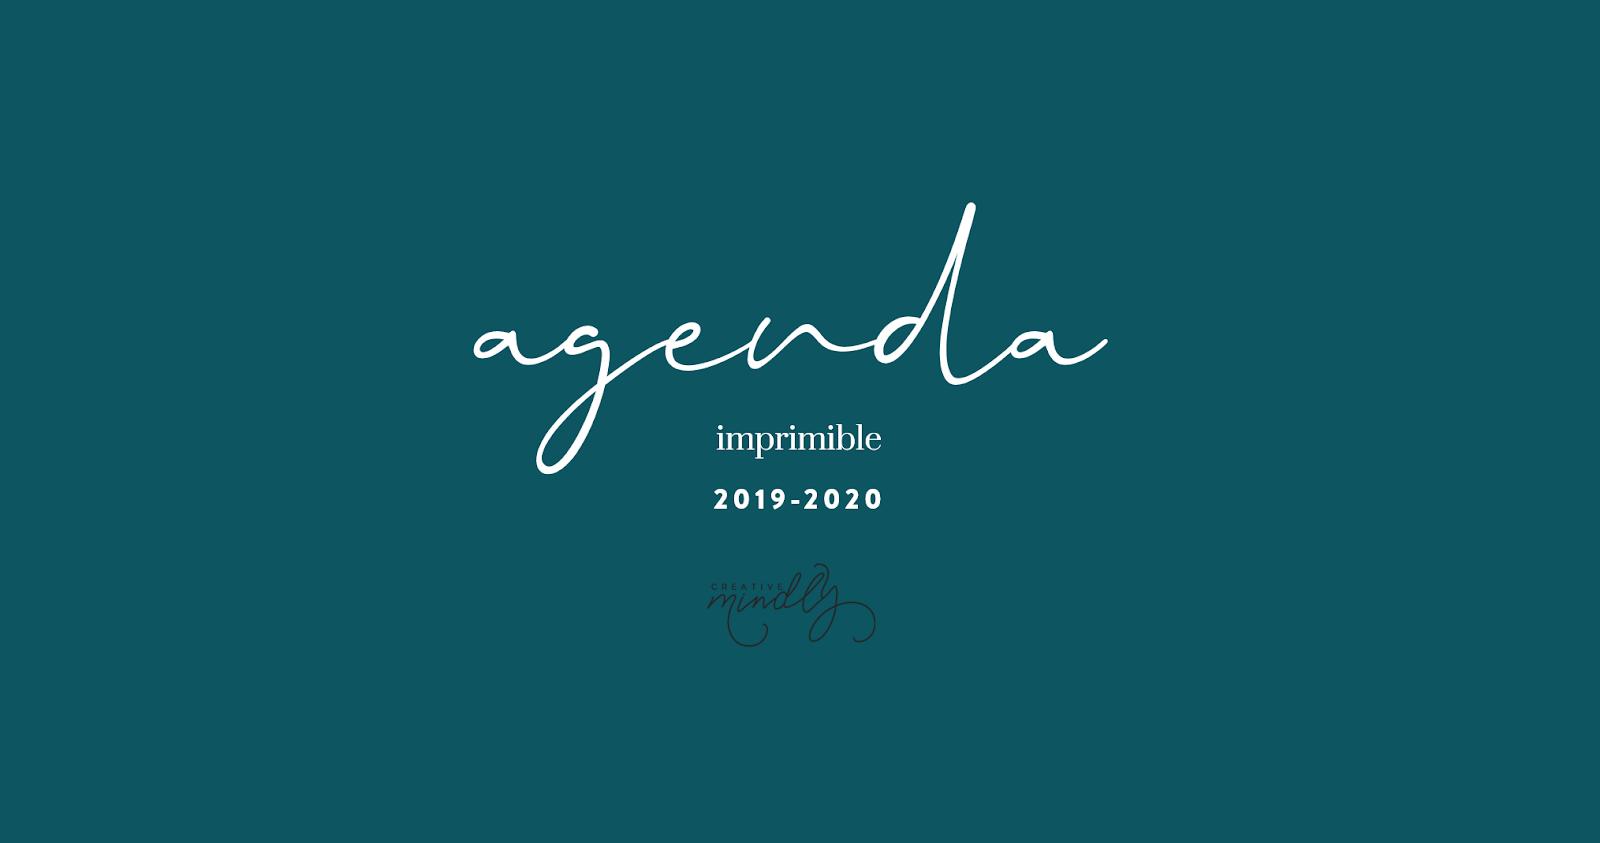 Calendario Agenda 2020 Para Imprimir.Creative Mindly Agenda Imprimible 2019 2020